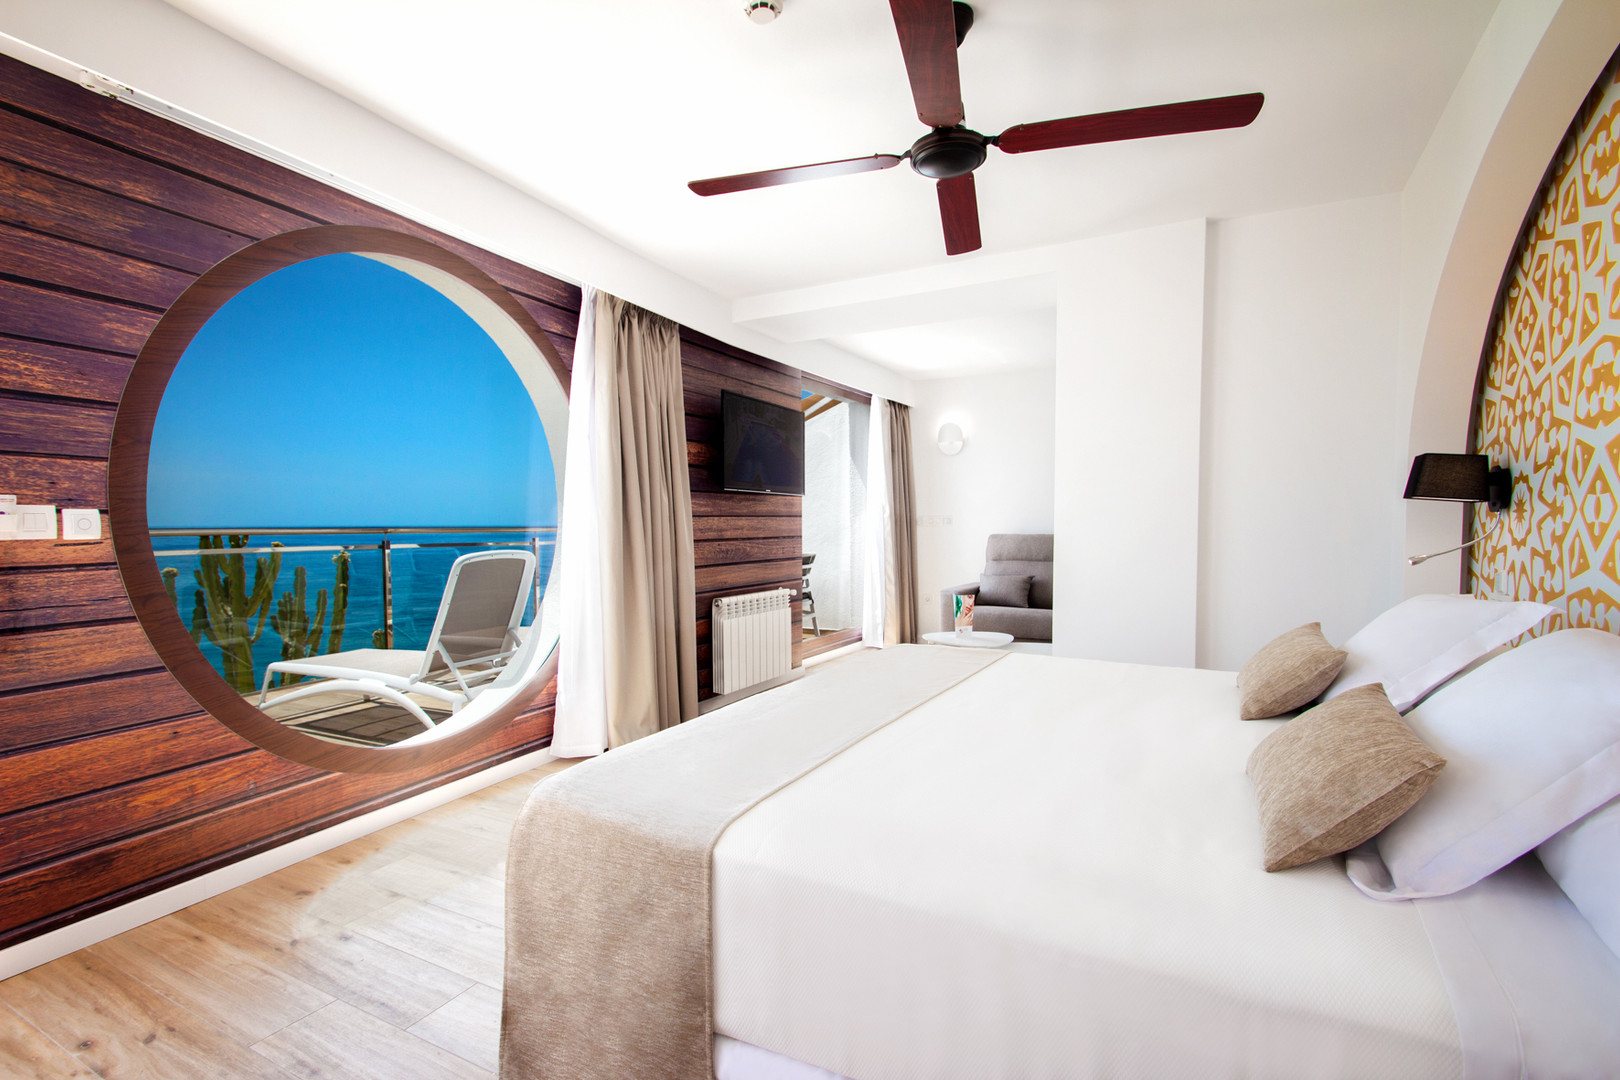 Tweepersoonskamer in het Hotel Montiboli